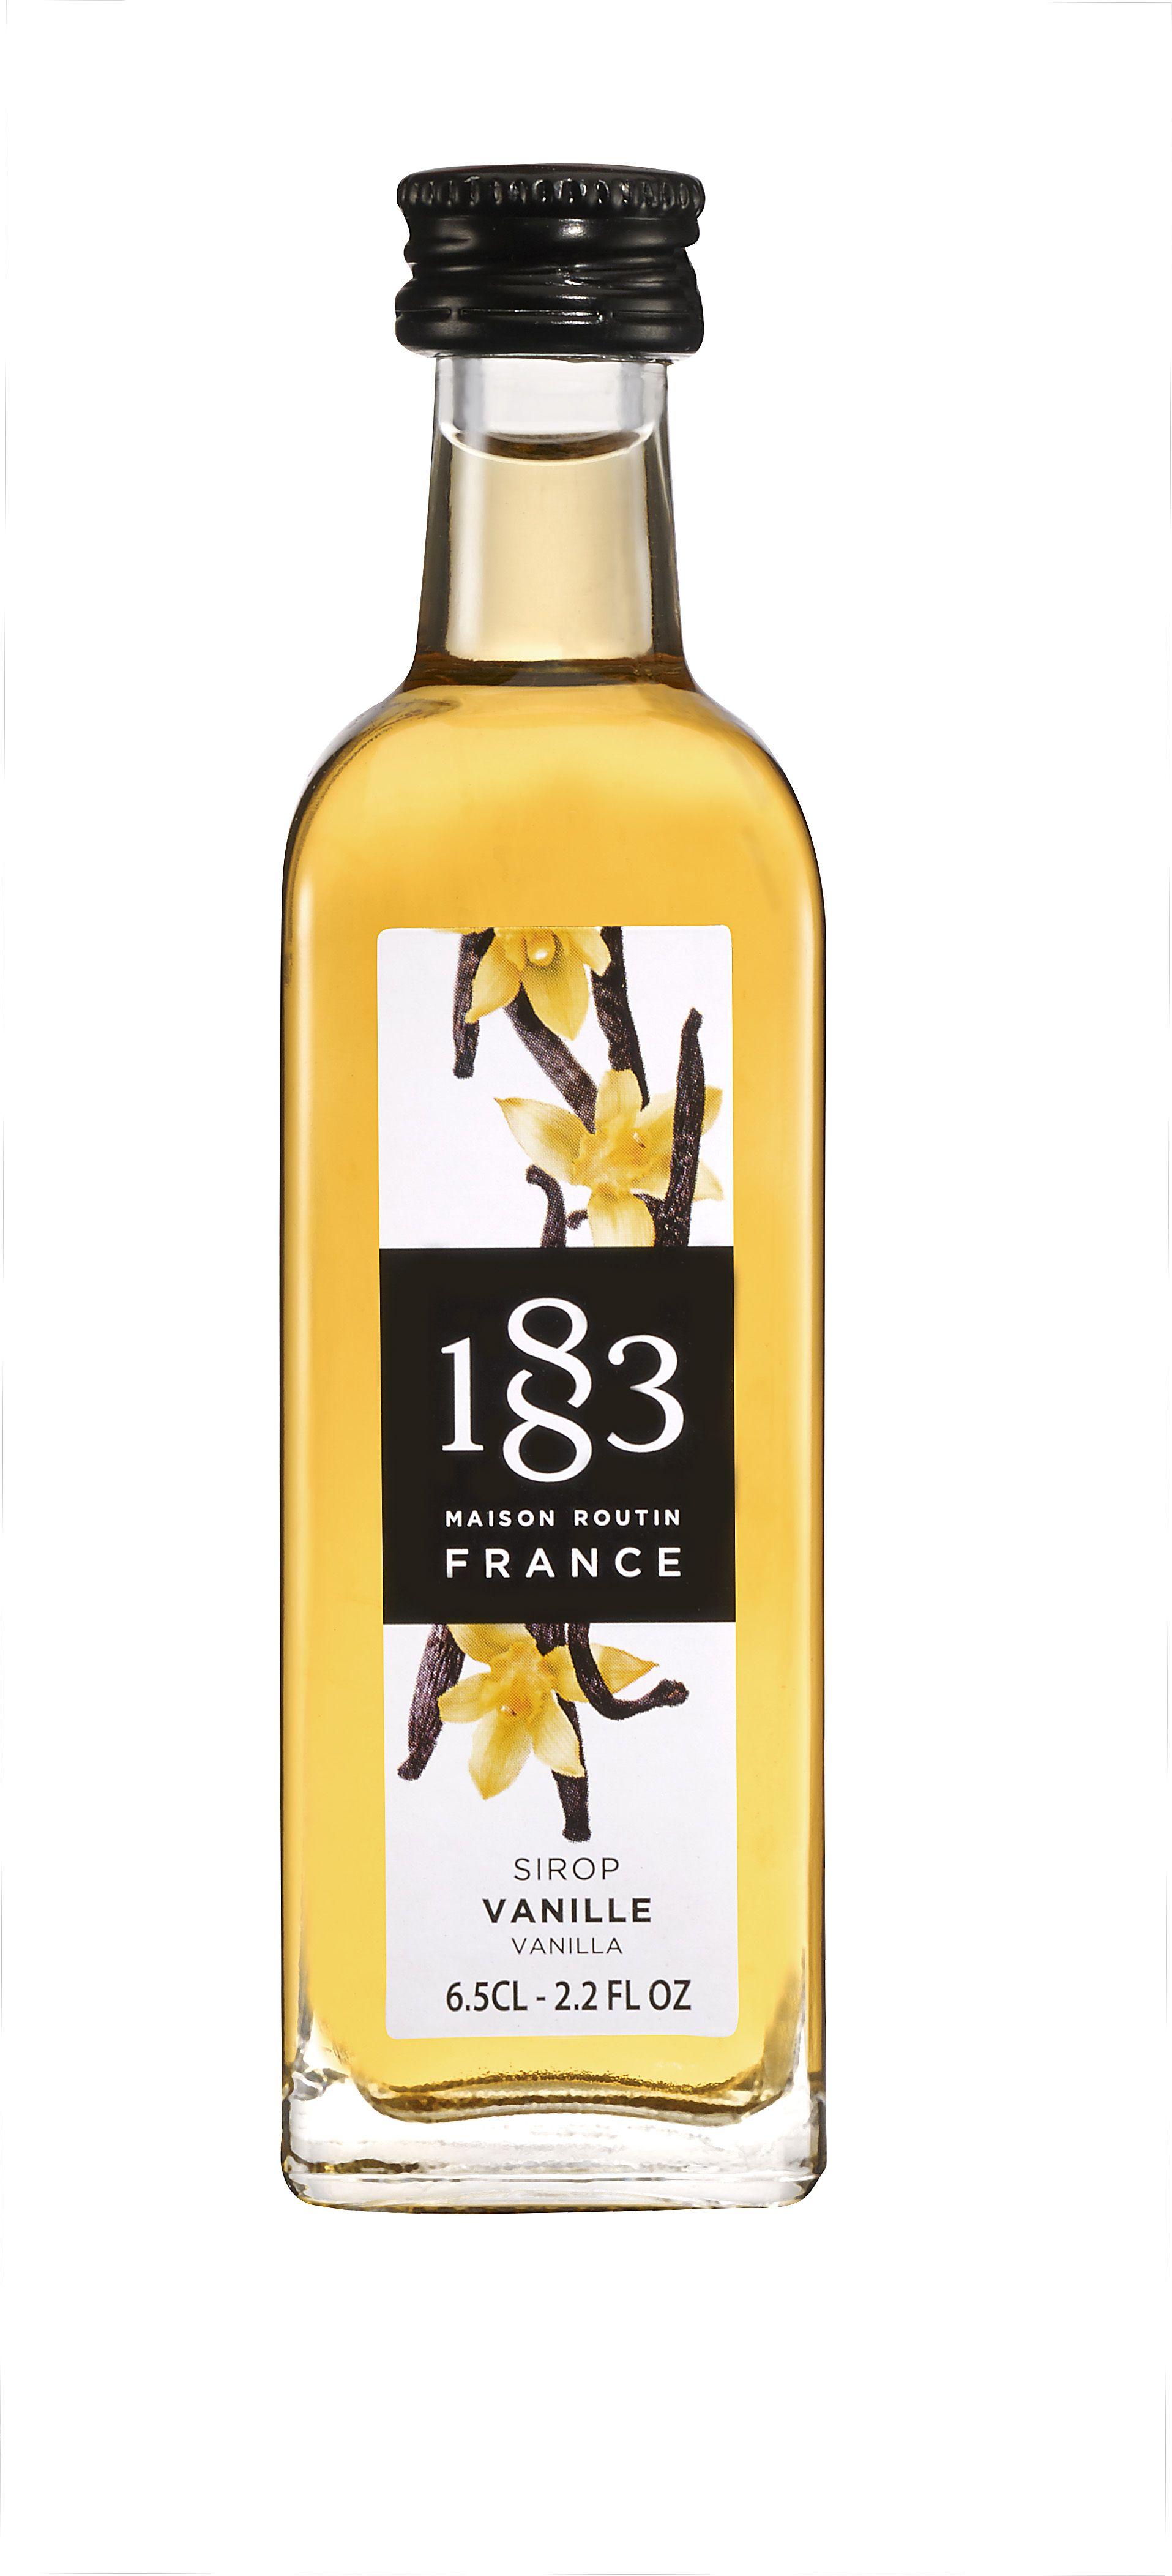 1883 Syrup Vanilla 6.5cl Miniature